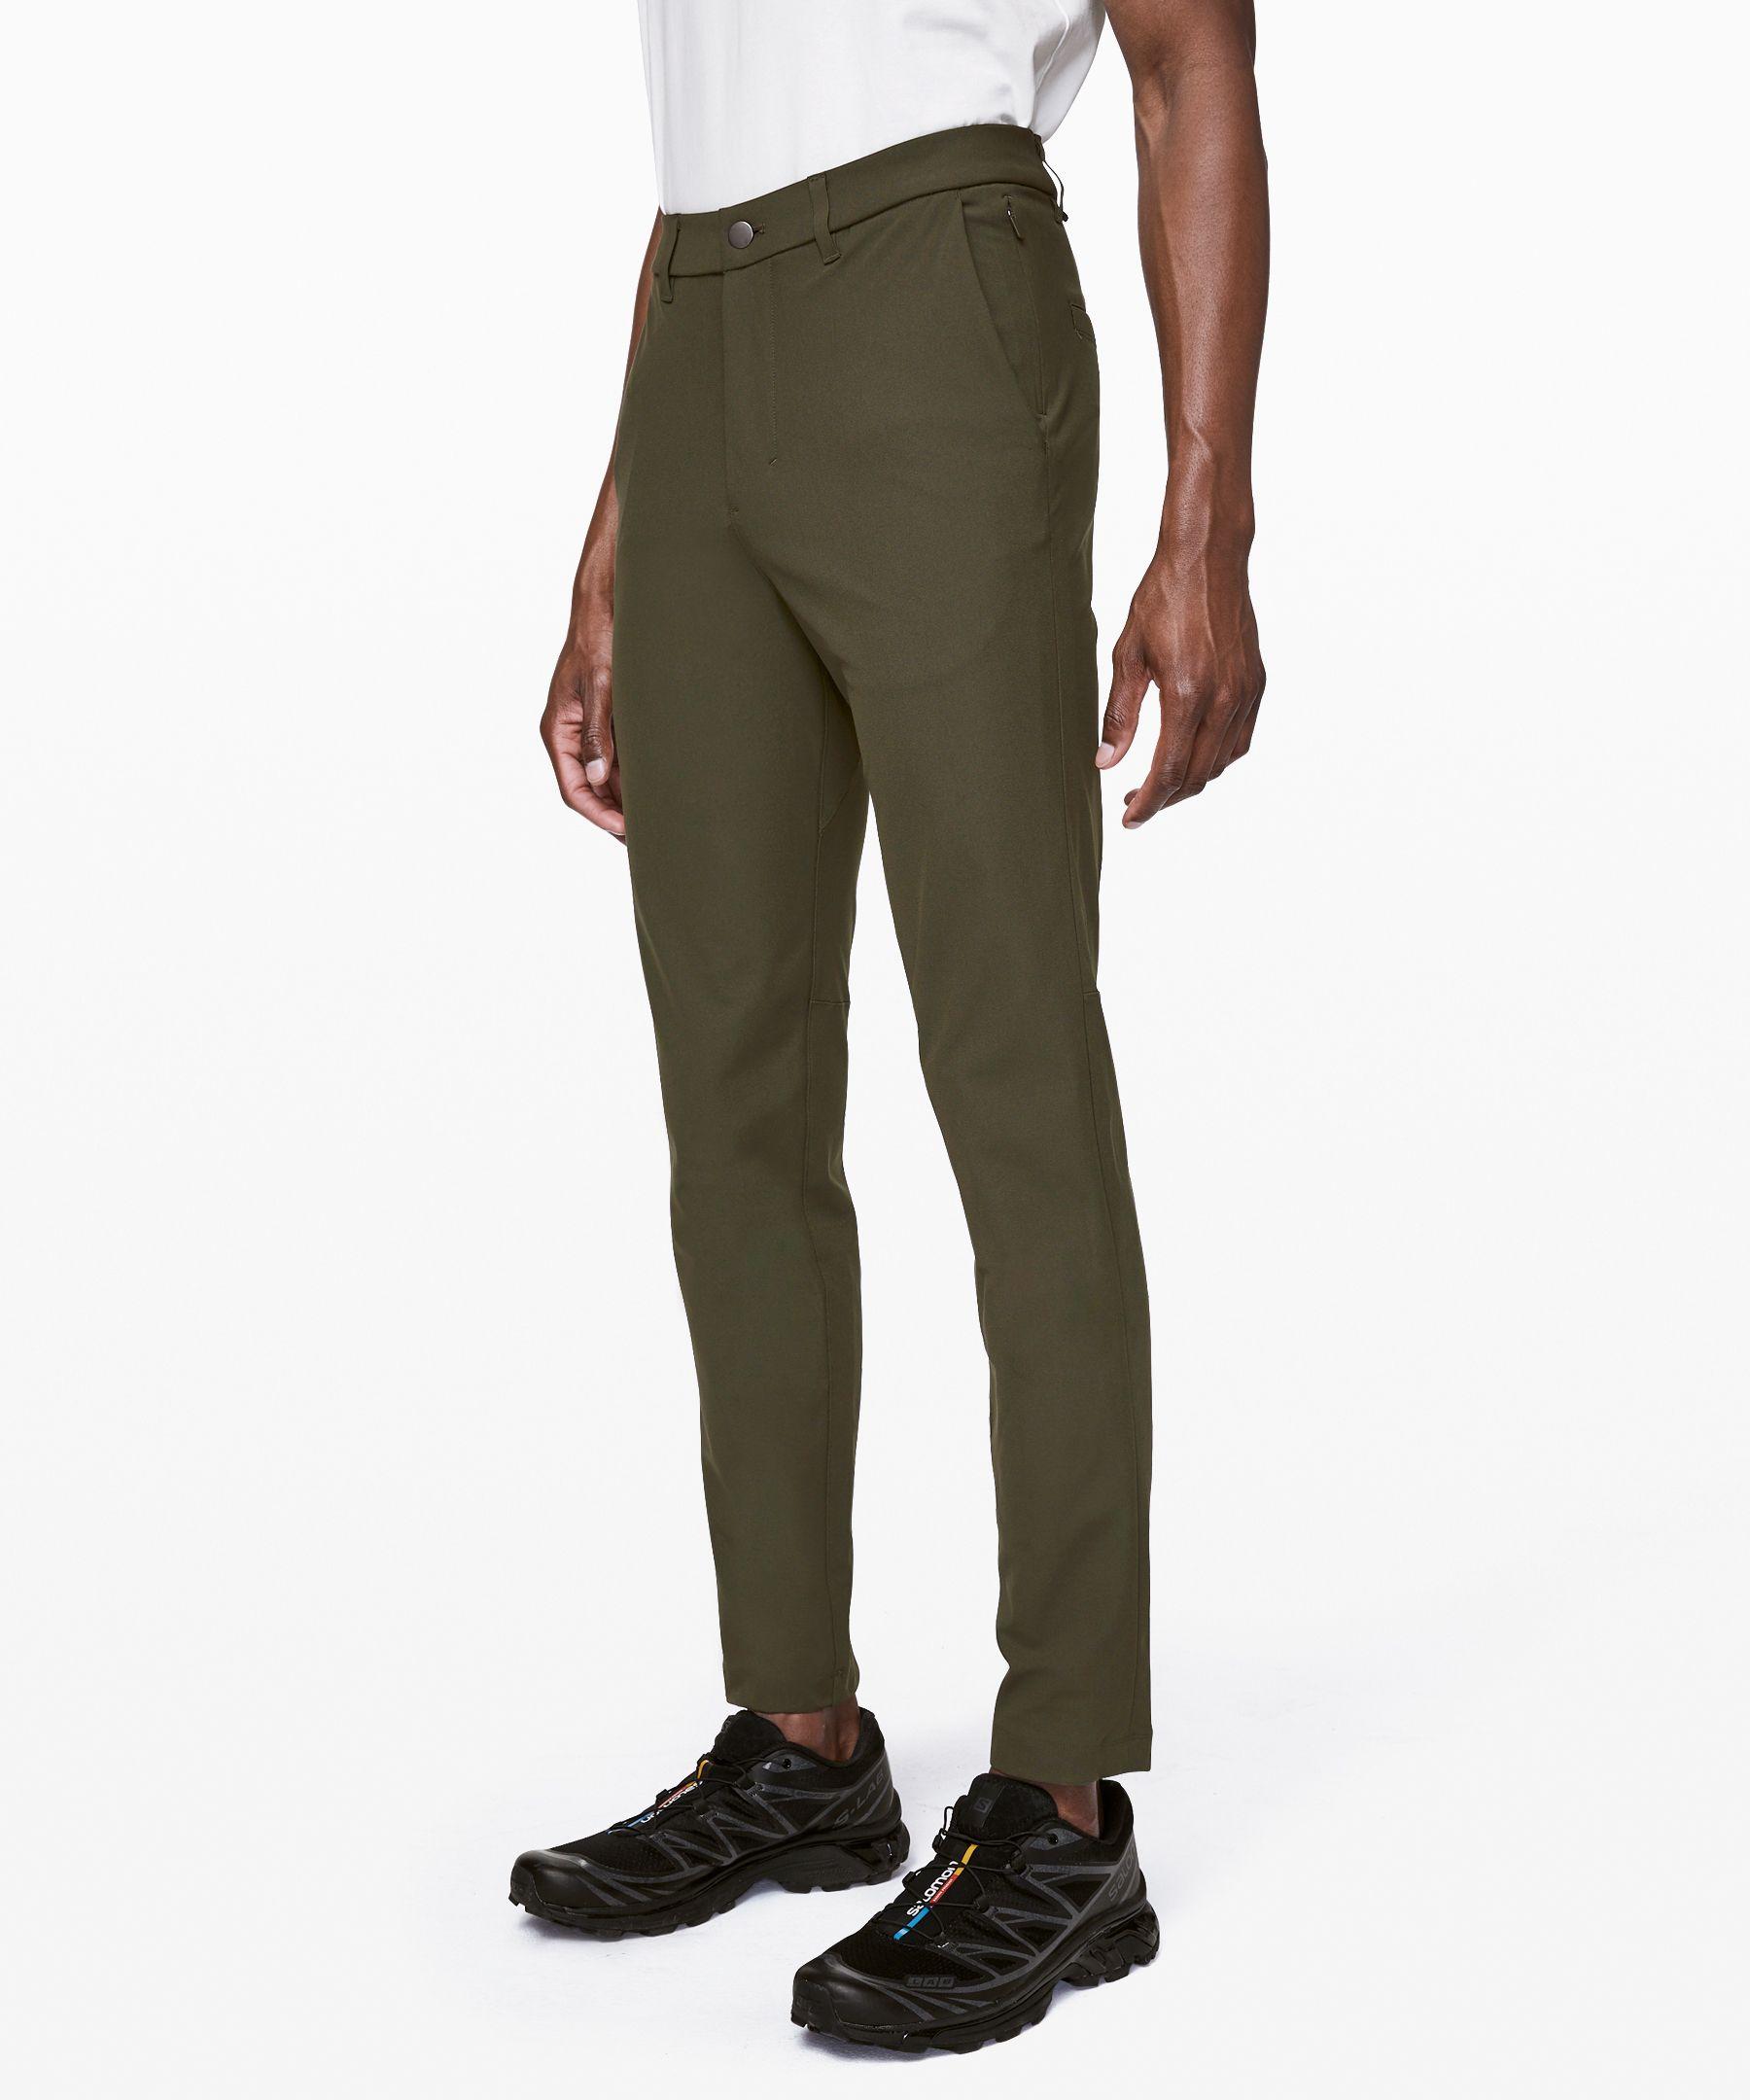 COMMAND PANT, Menswear, Bottoms